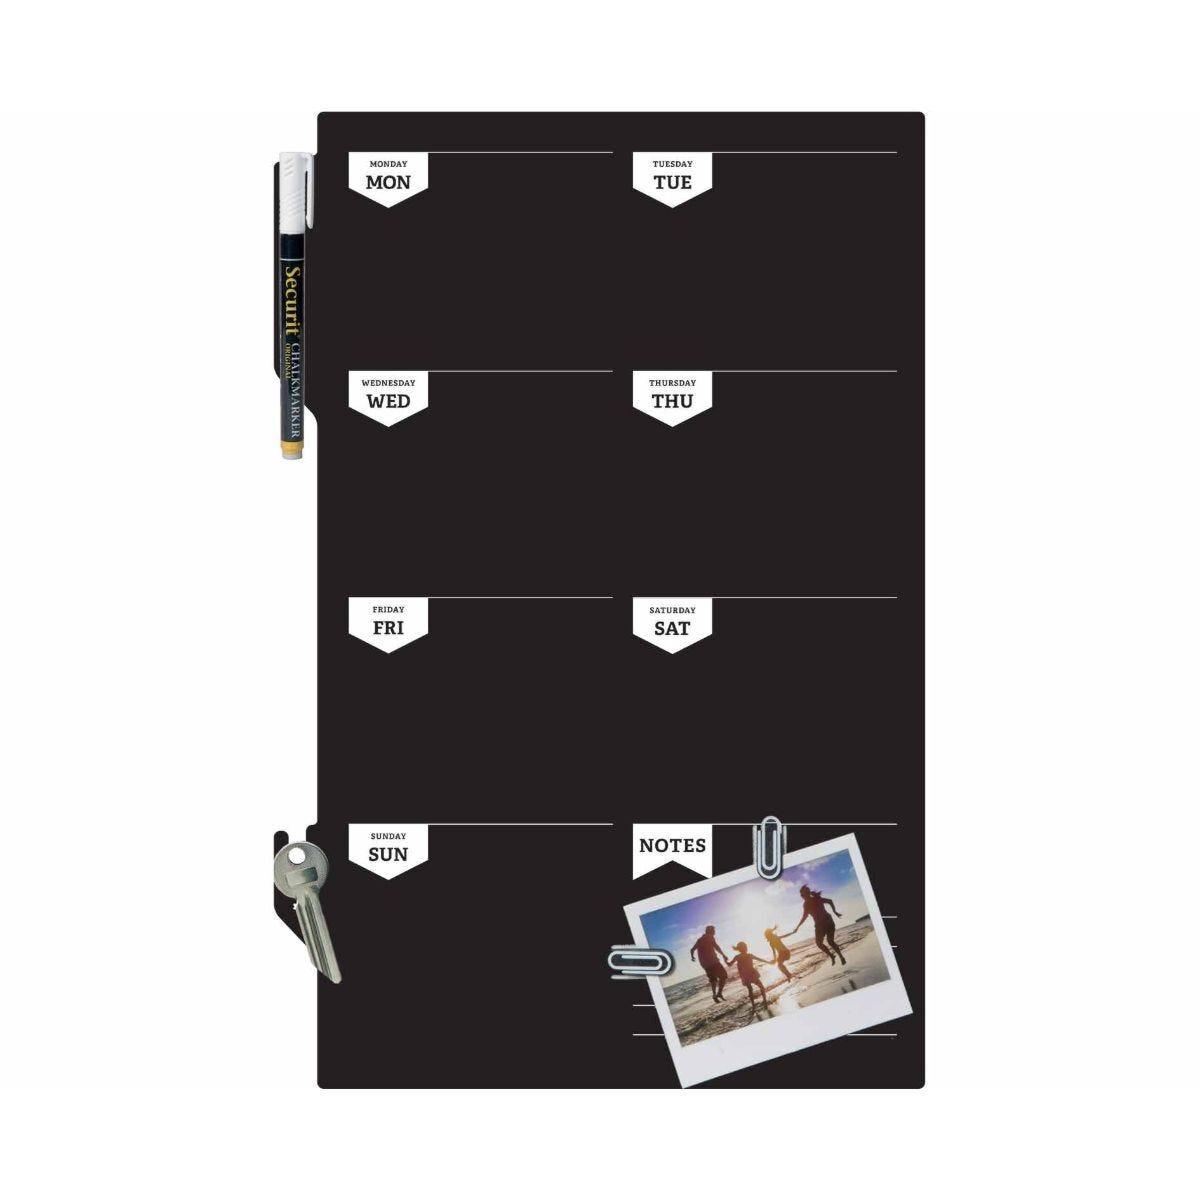 Securit Silhouette Chalkboard Week Planner with Marker